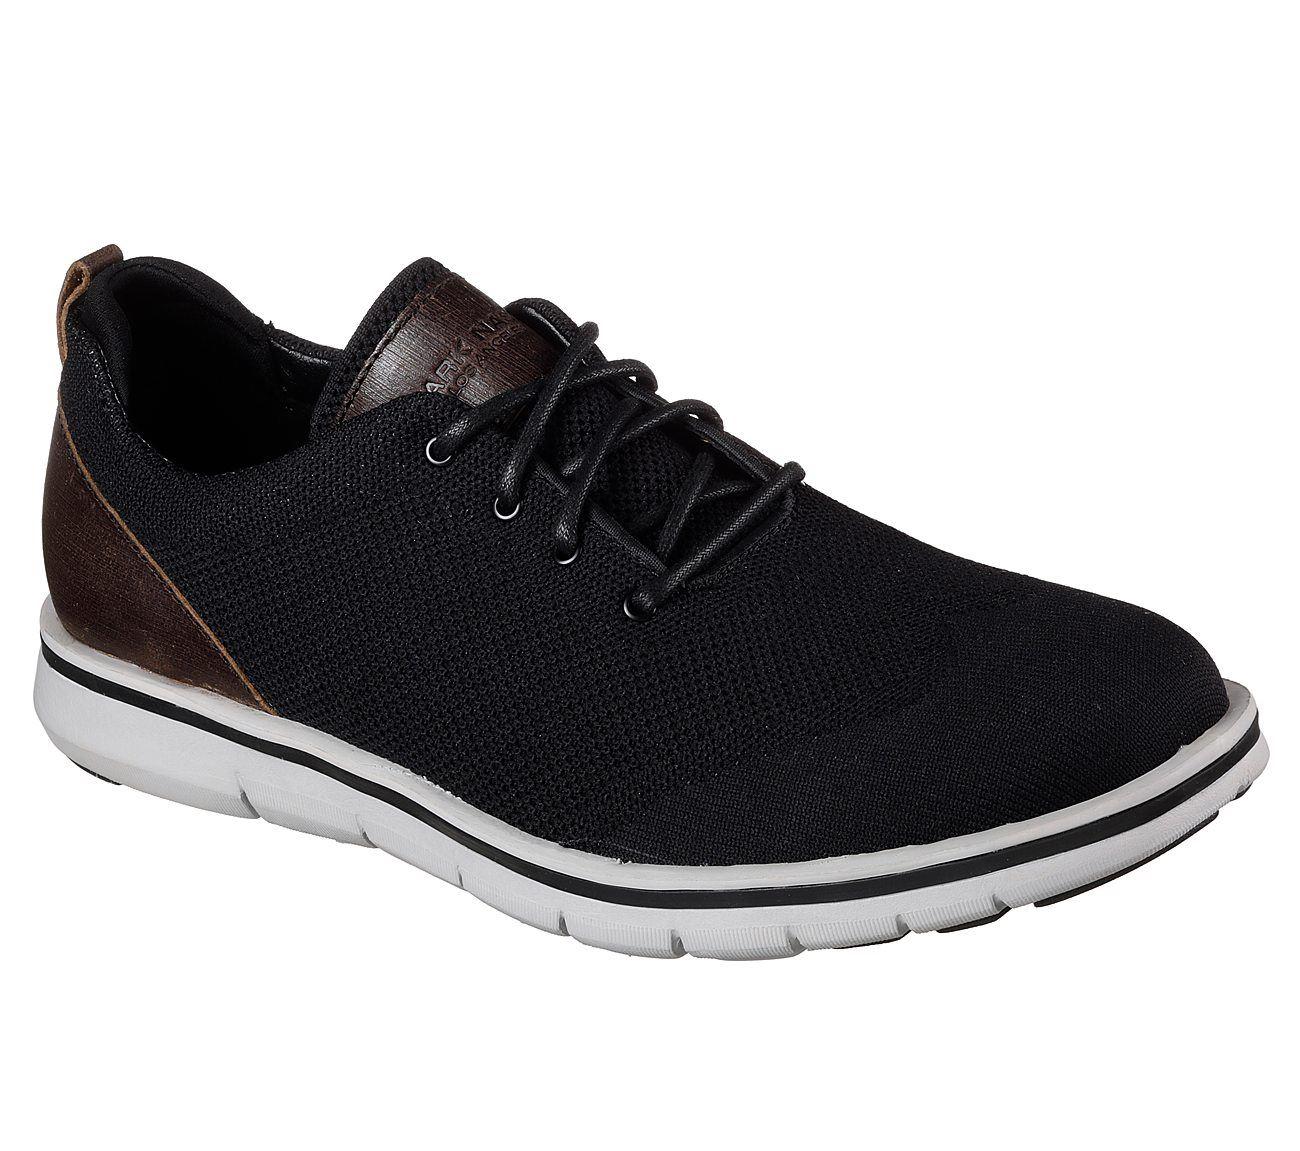 Skechers MARK NASON Herren Premium artikulierter - bradmoor Schuh in schwarz